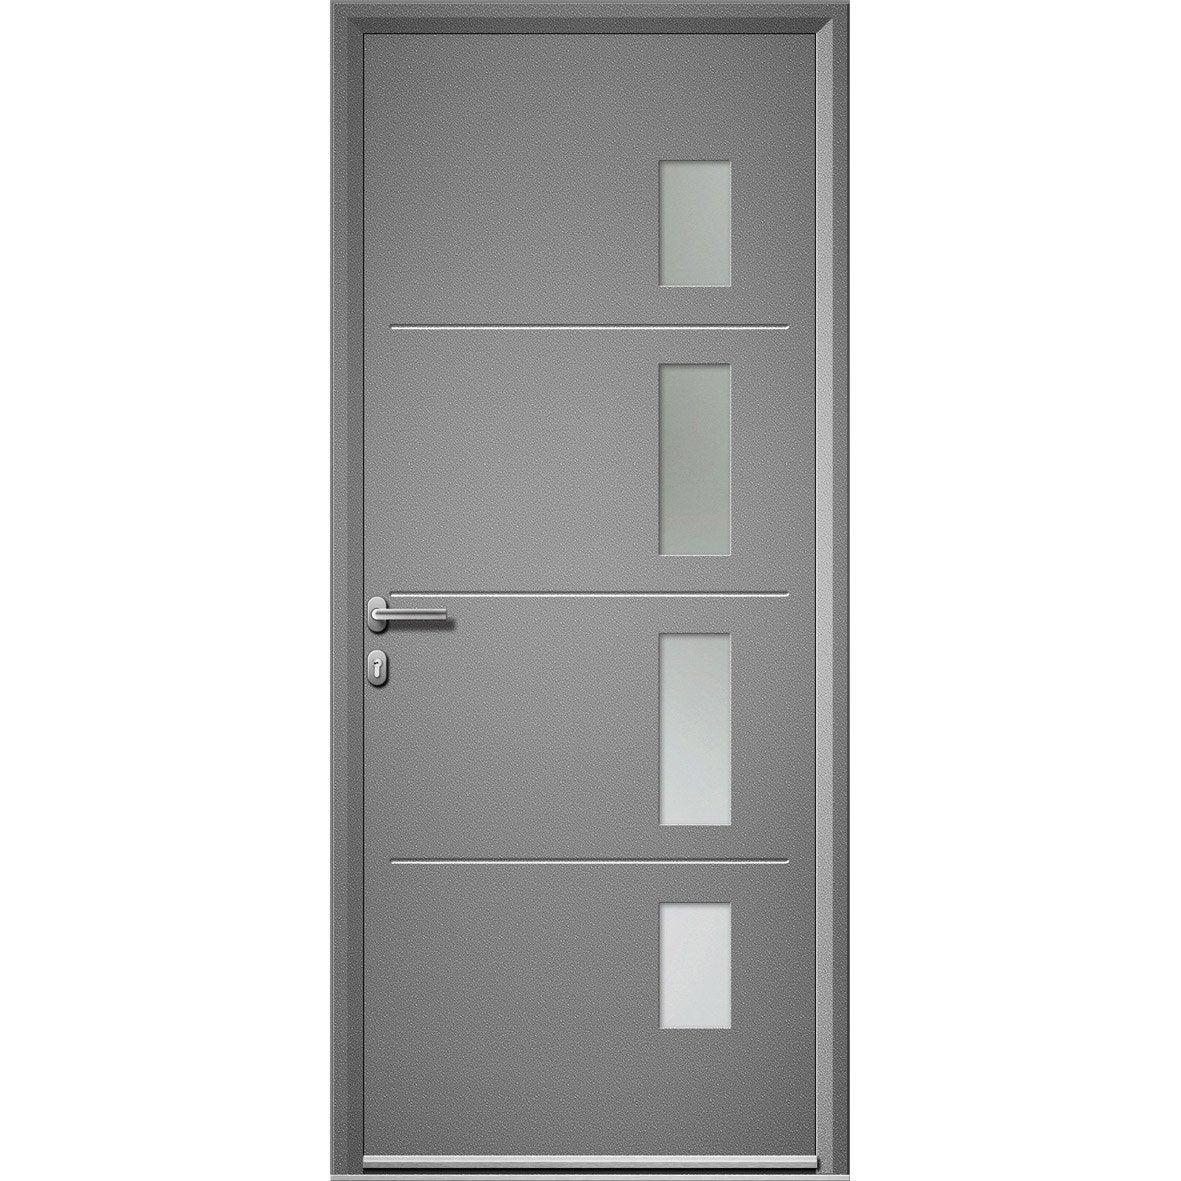 Leroy merlin porte entree alu maison design - Portes entree leroy merlin ...